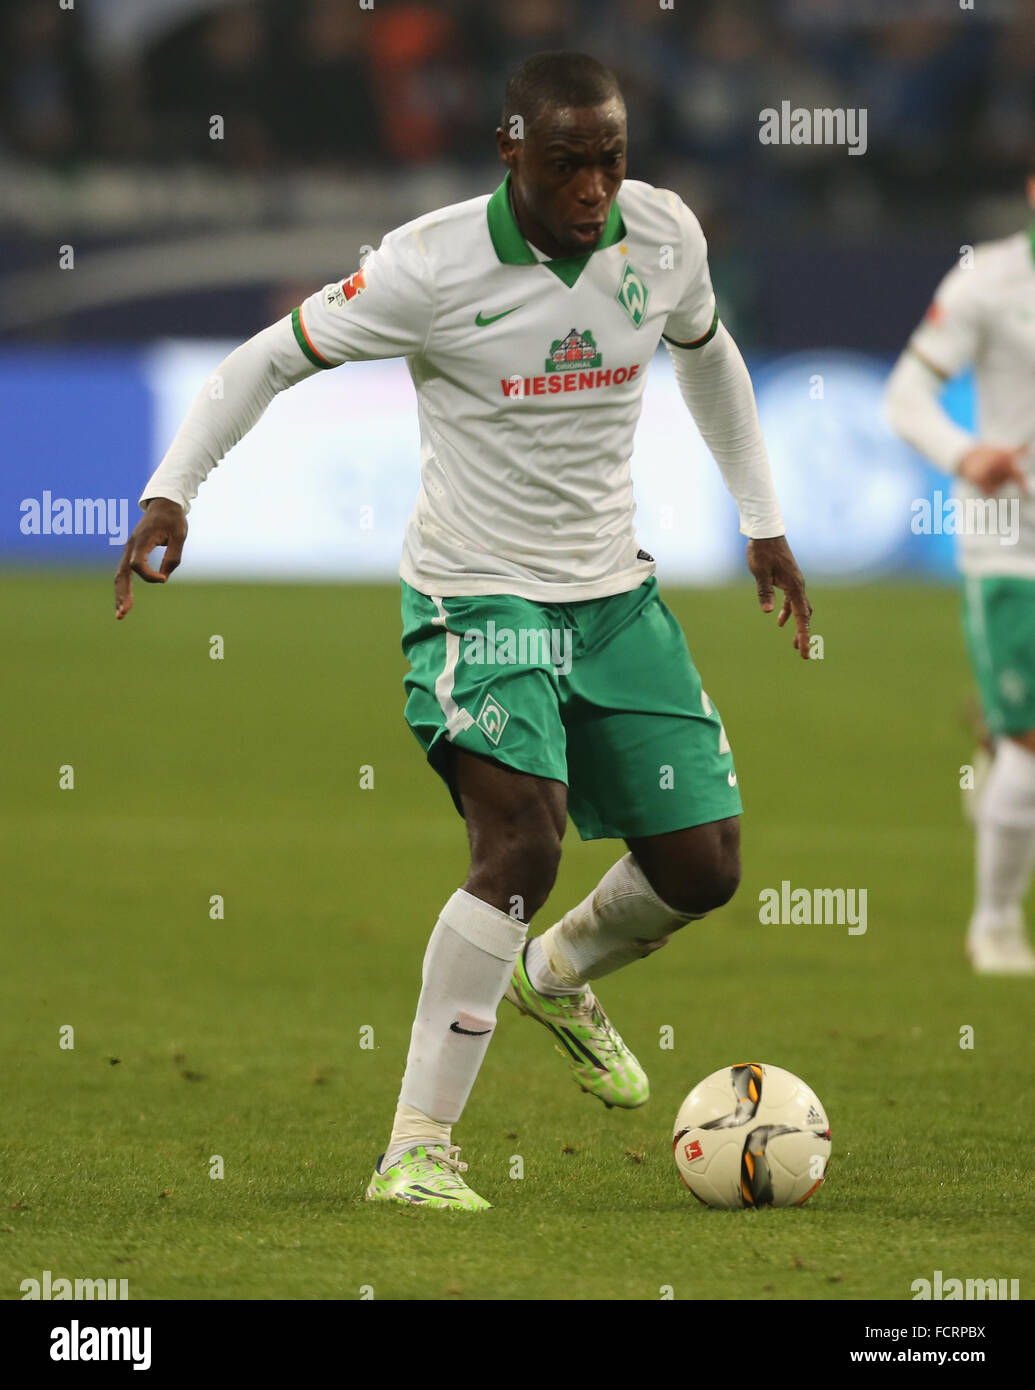 Gelsenkirchen, Germany. 24th January, 2016. Football Bundesliga, FC Schalke 04 vs Werder Bremen, Gelsenkirchen, - Stock Image